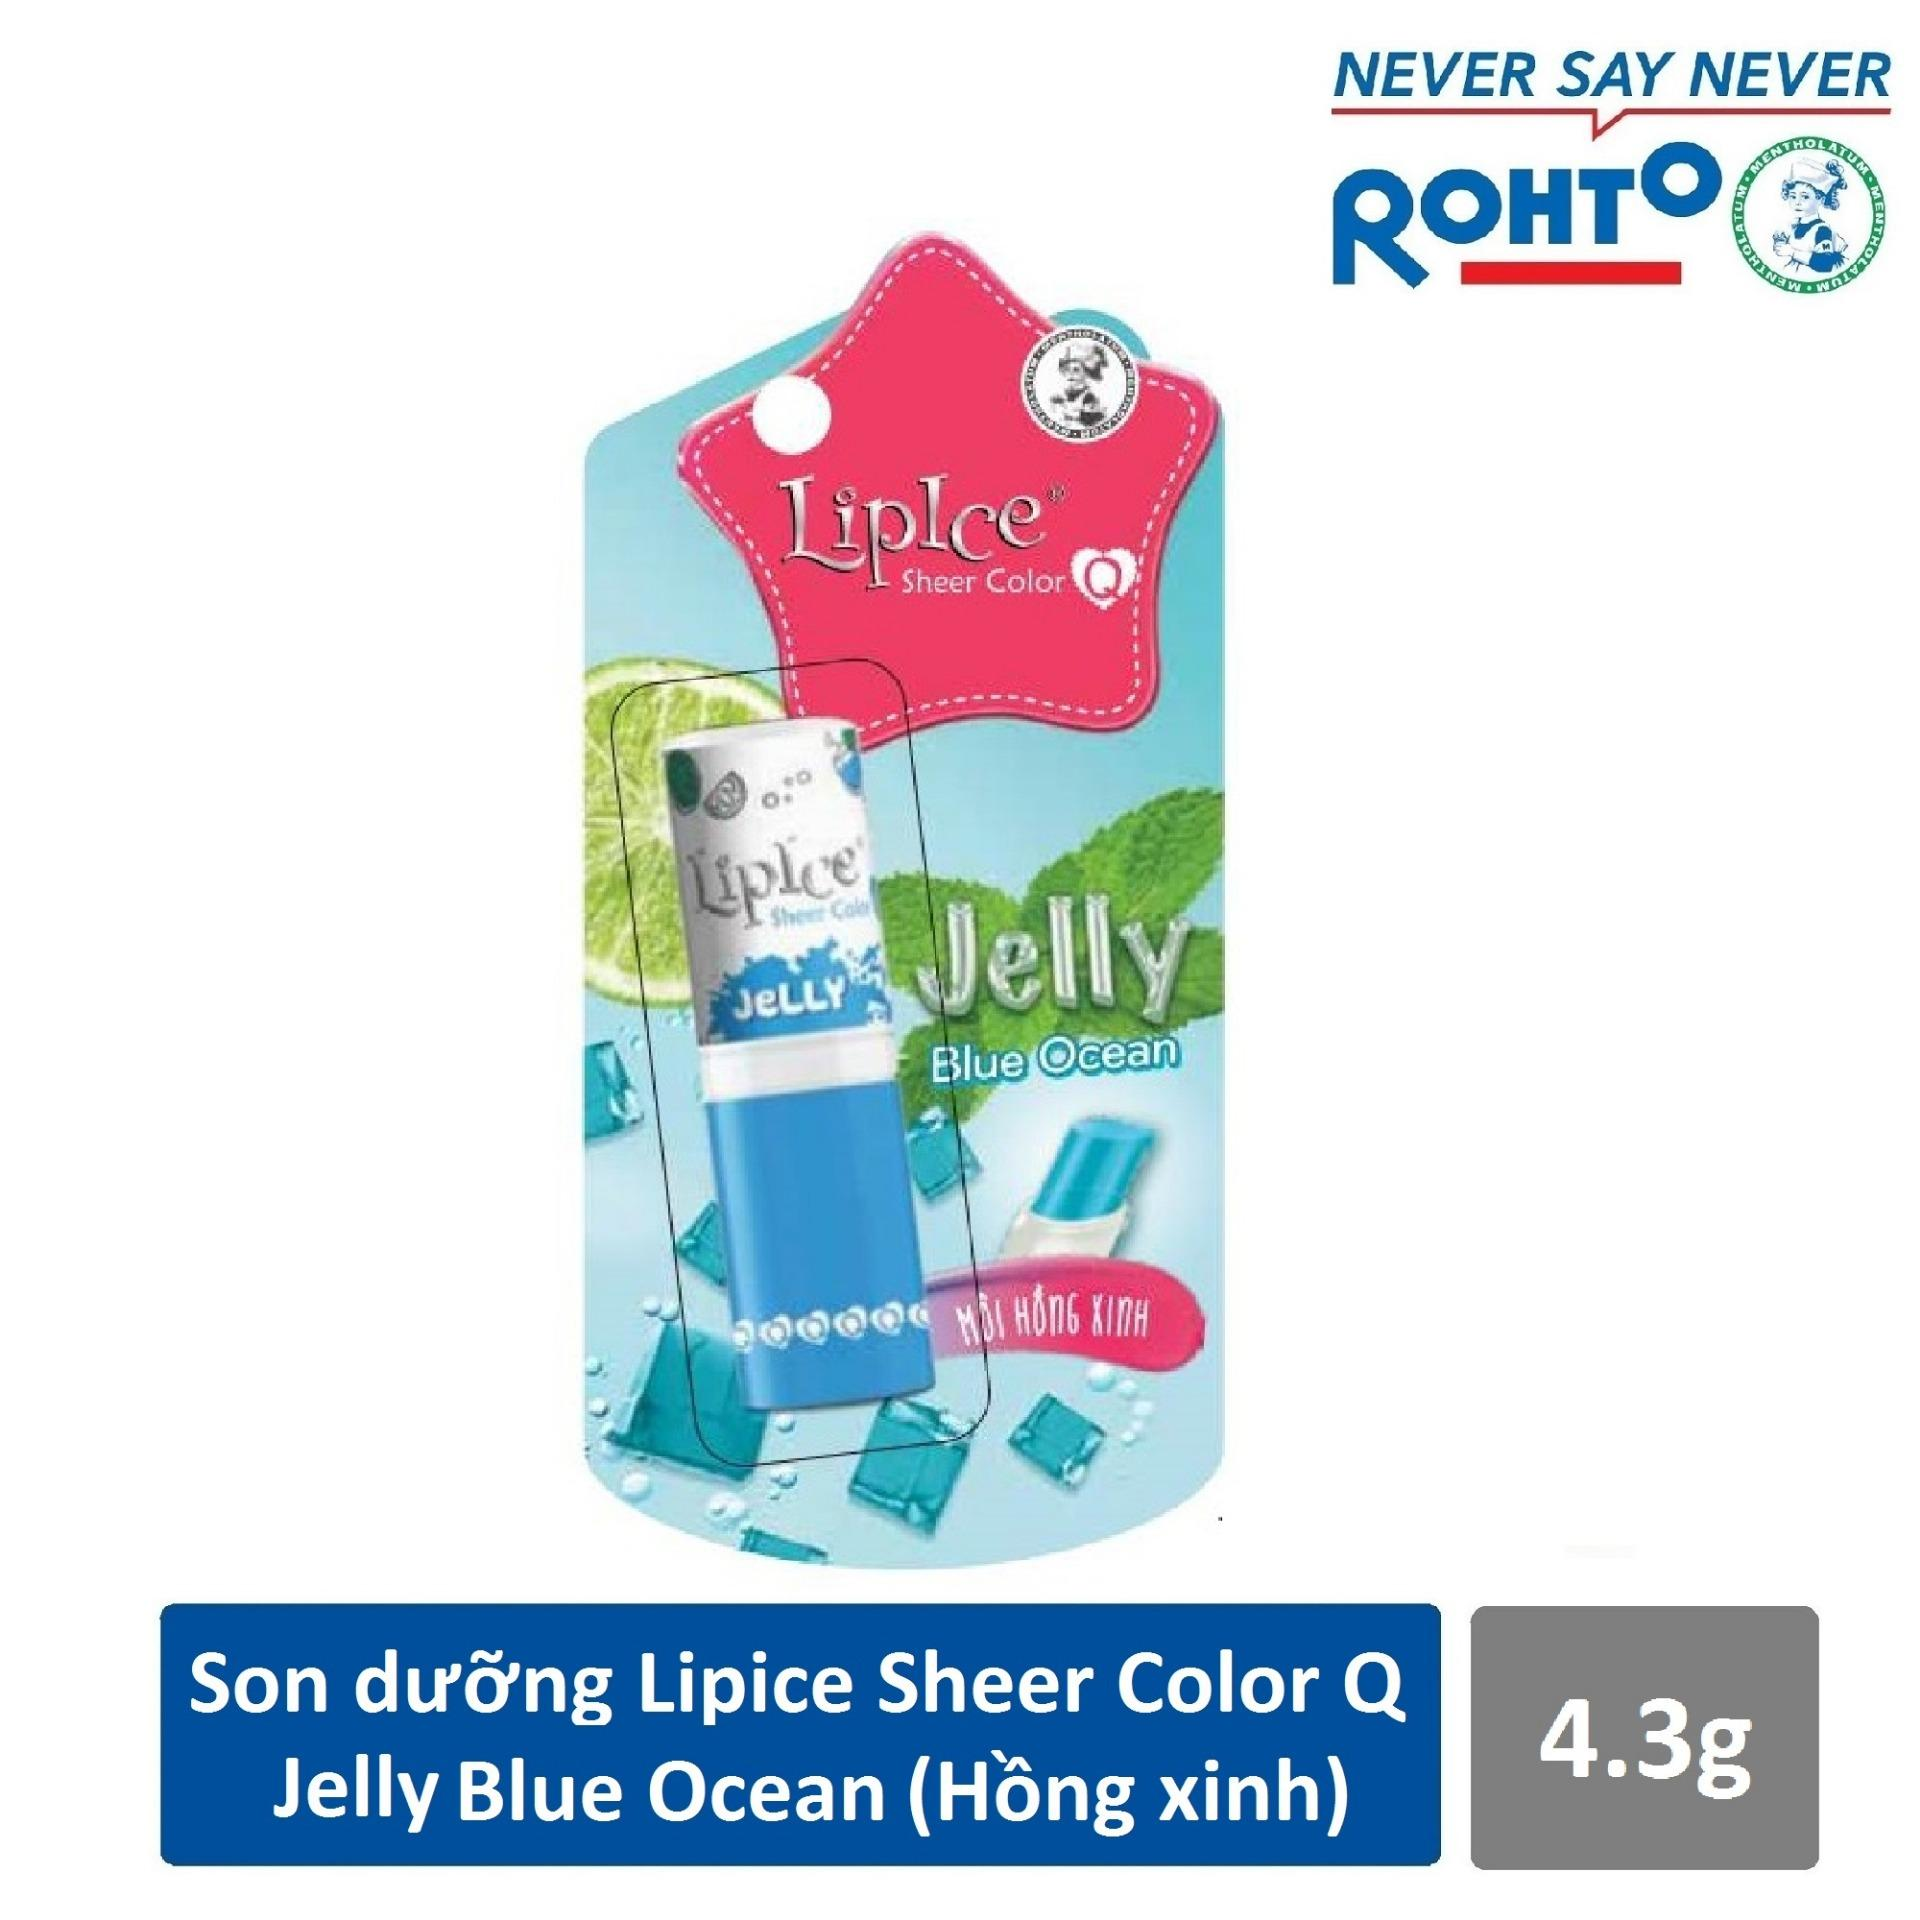 Son dưỡng LipIce Sheer Color Q Jelly Blue Ocean 4.3g (Hồng xinh)